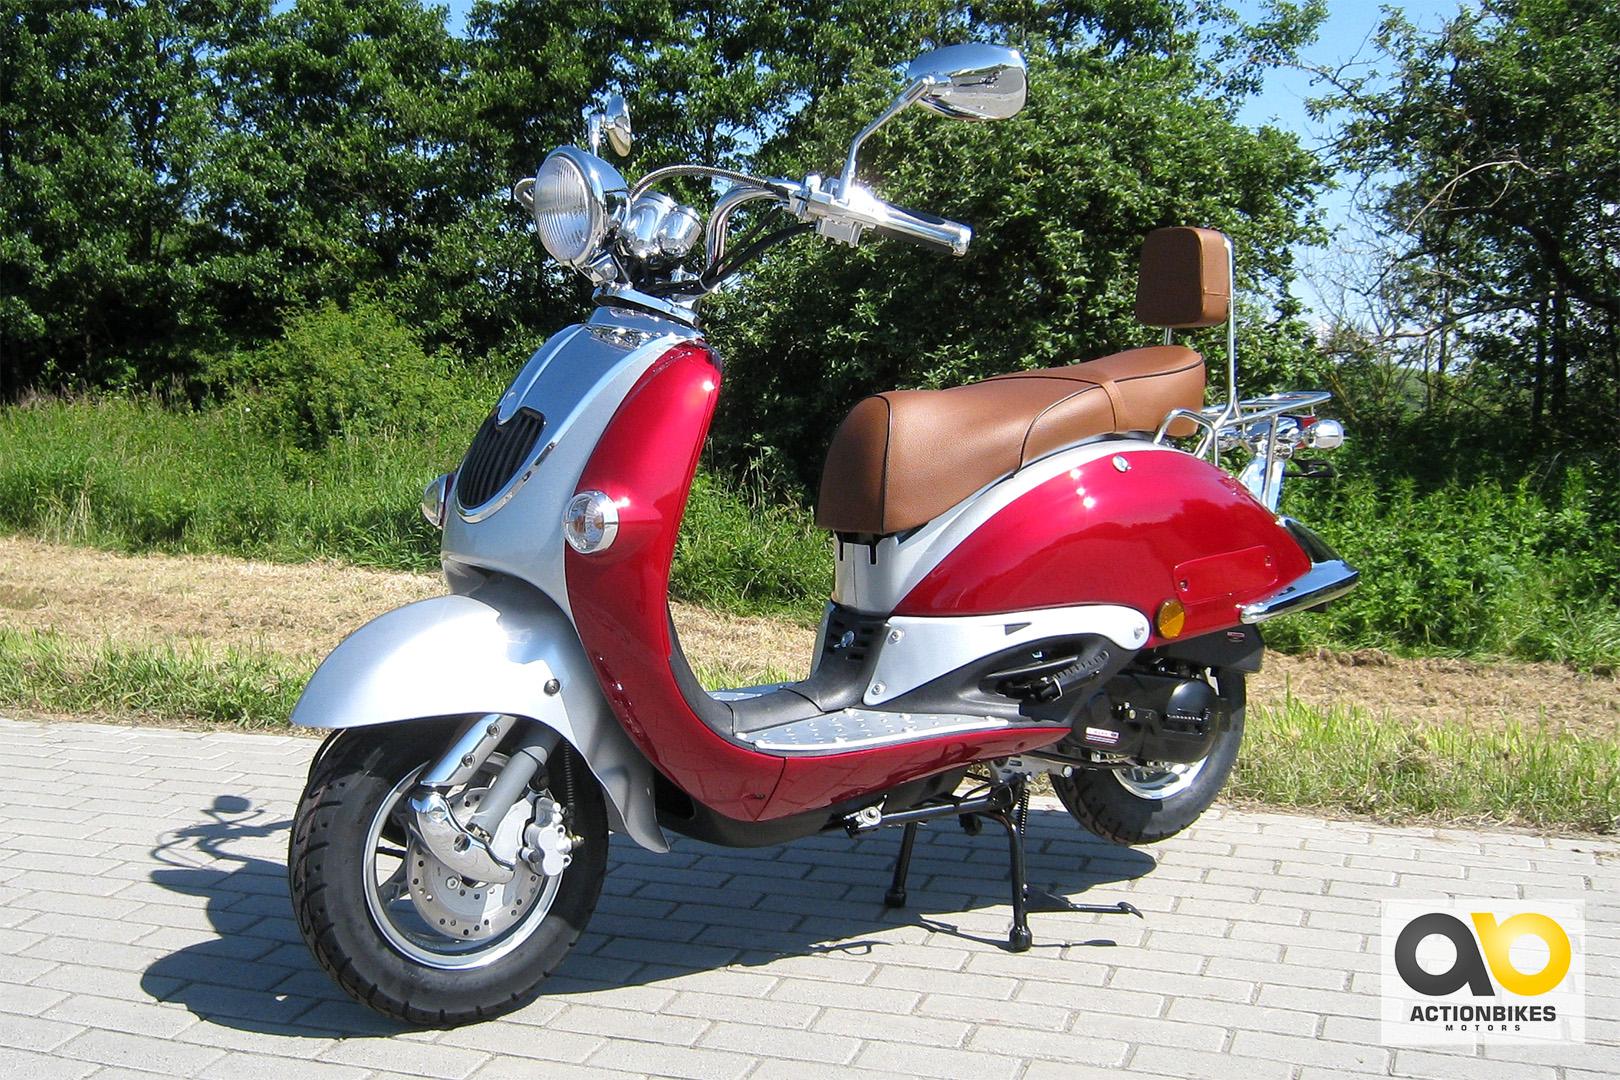 ZNEN RETRO SCOOTER QT-H50 MOFA 15.5 M/H MOTOR 49cc